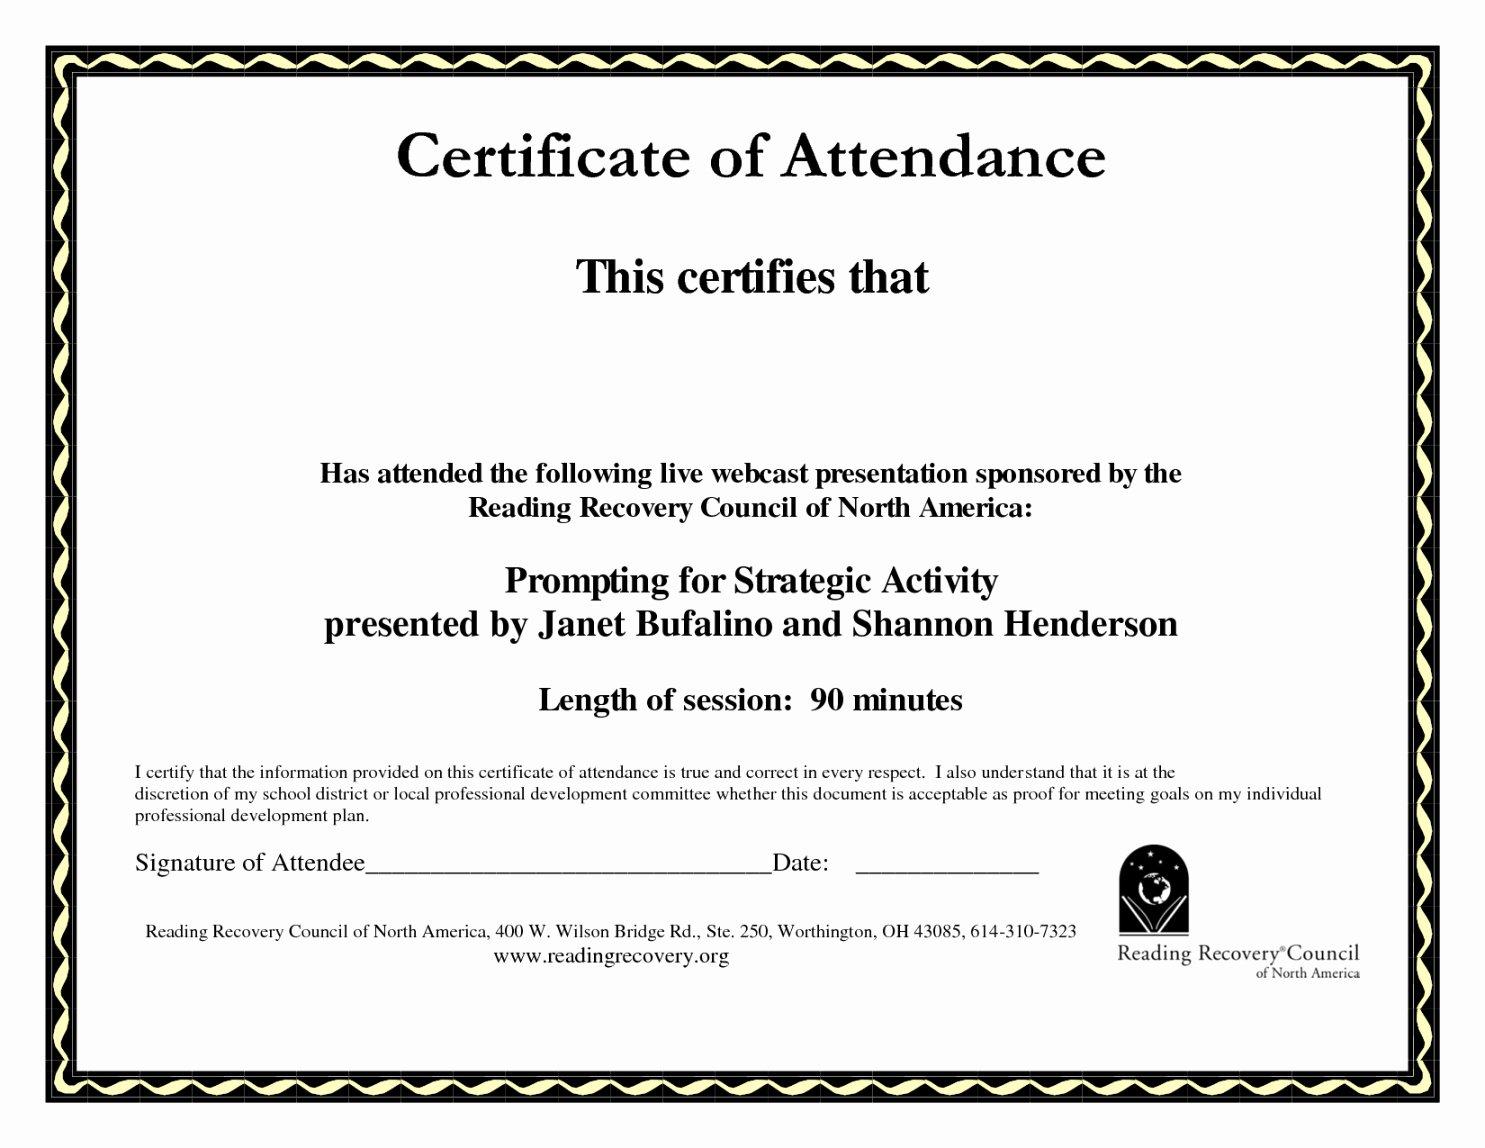 Perfect attendance Certificate Template Luxury Certificate Perfect attendance Template